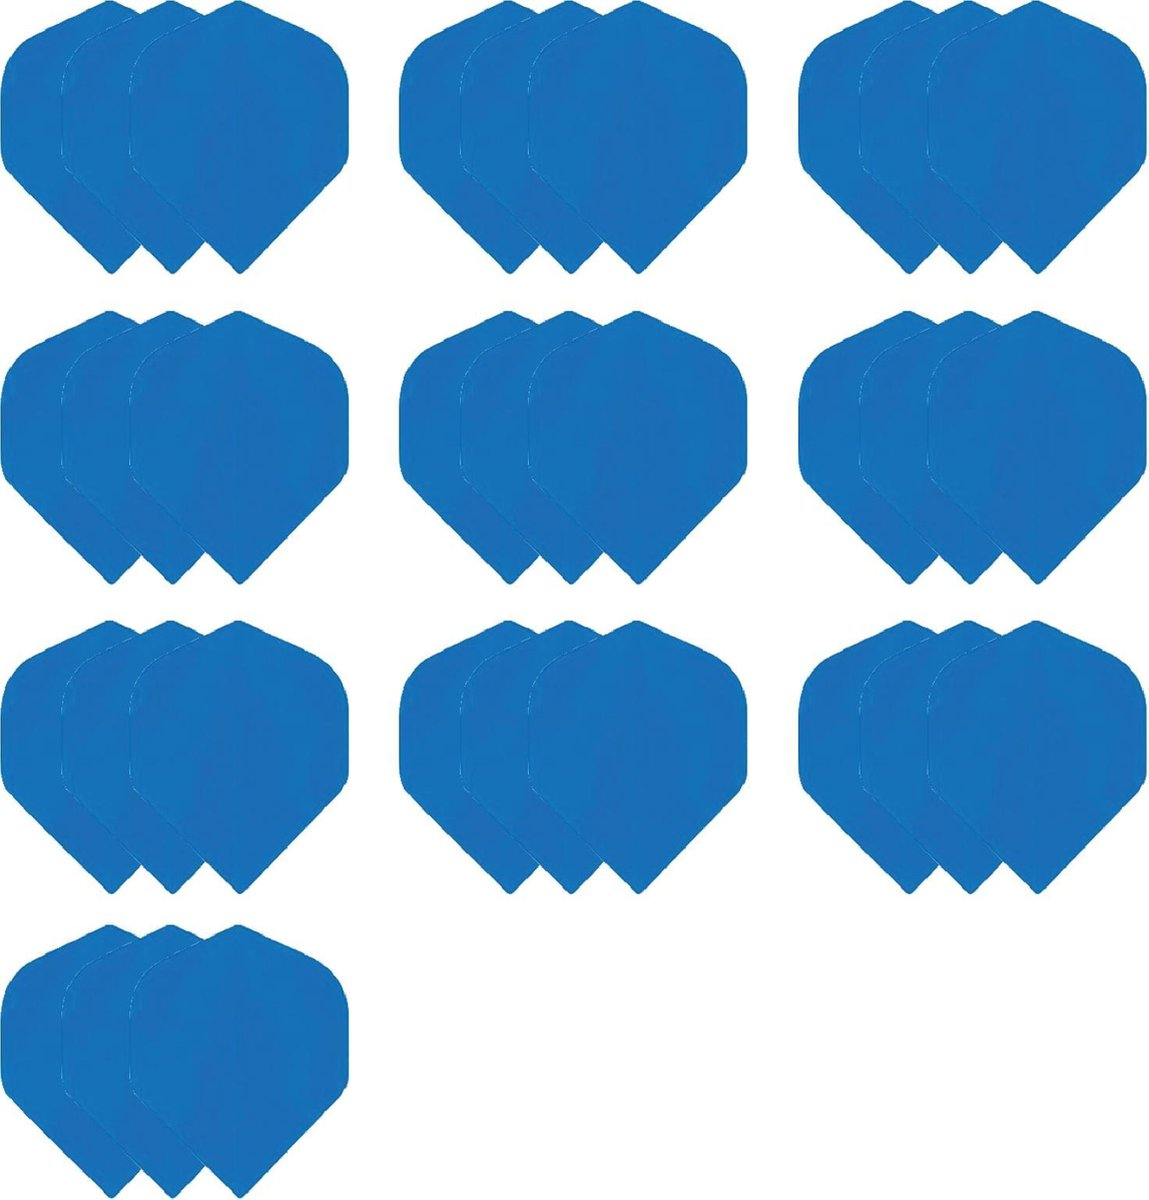 deDartshop 10 Sets (30 stuks) Dragon Poly - dart flights - Multipack - Blauw - darts flights